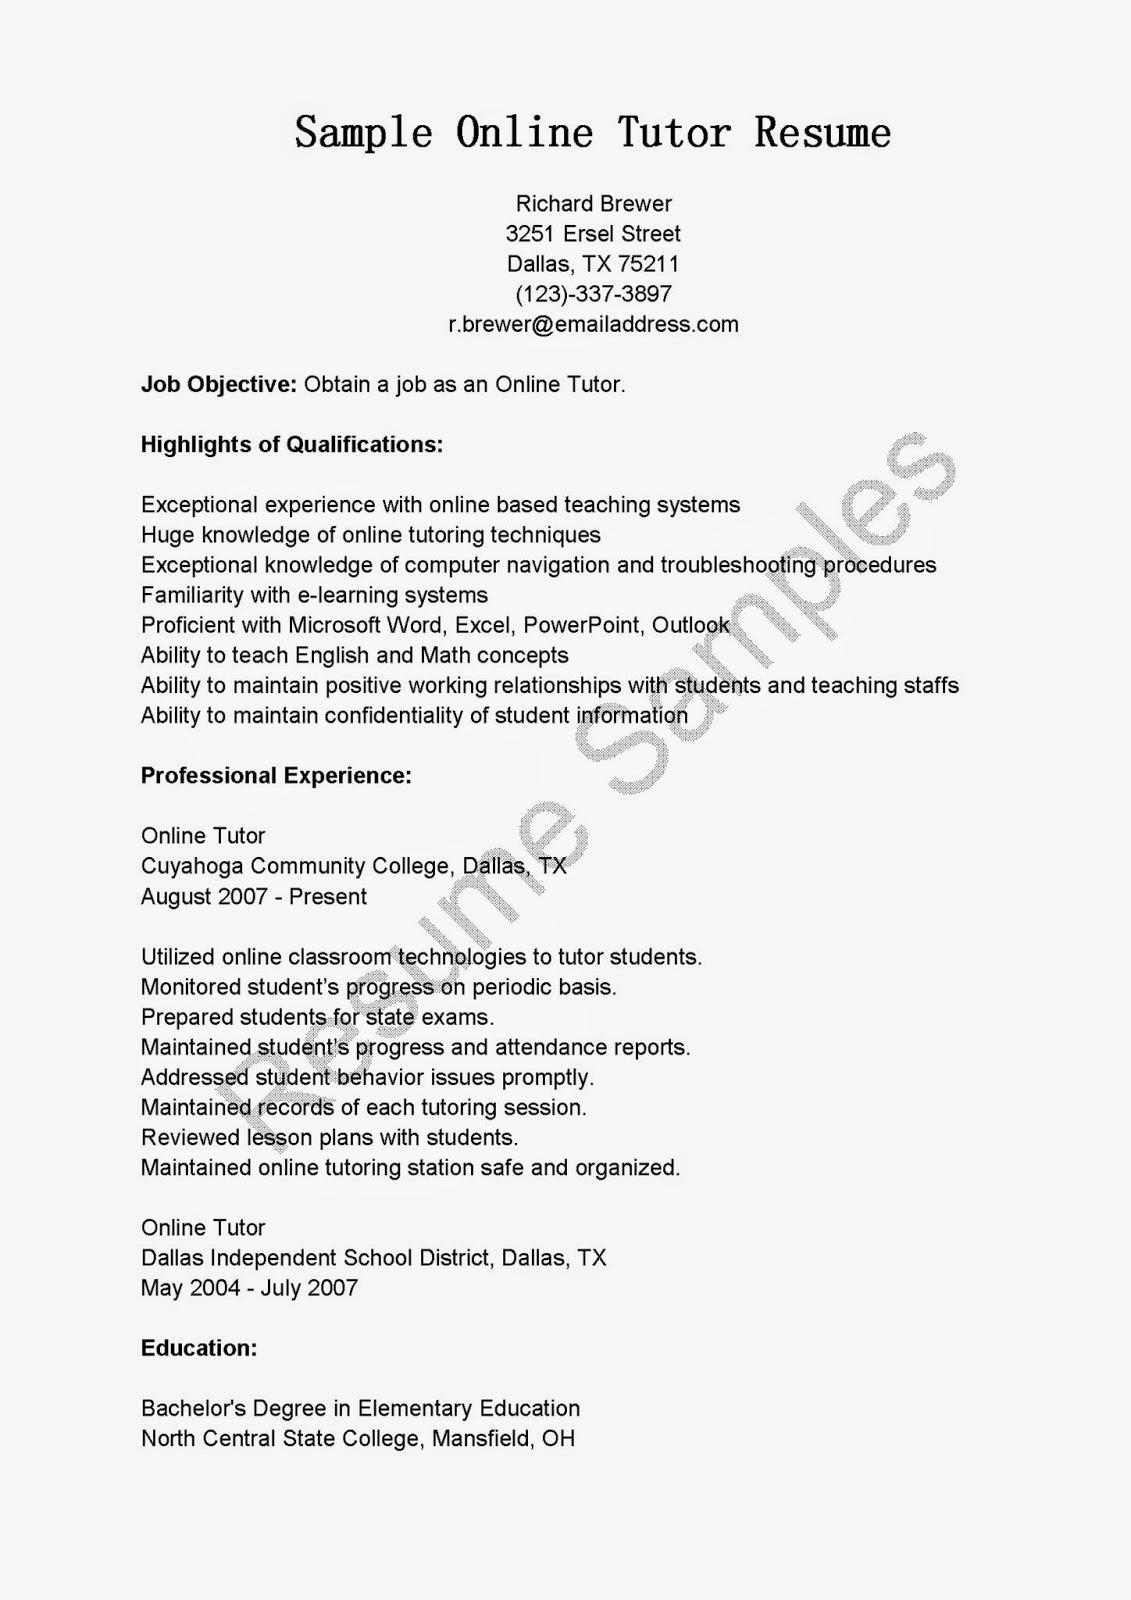 Resume For College Tutor